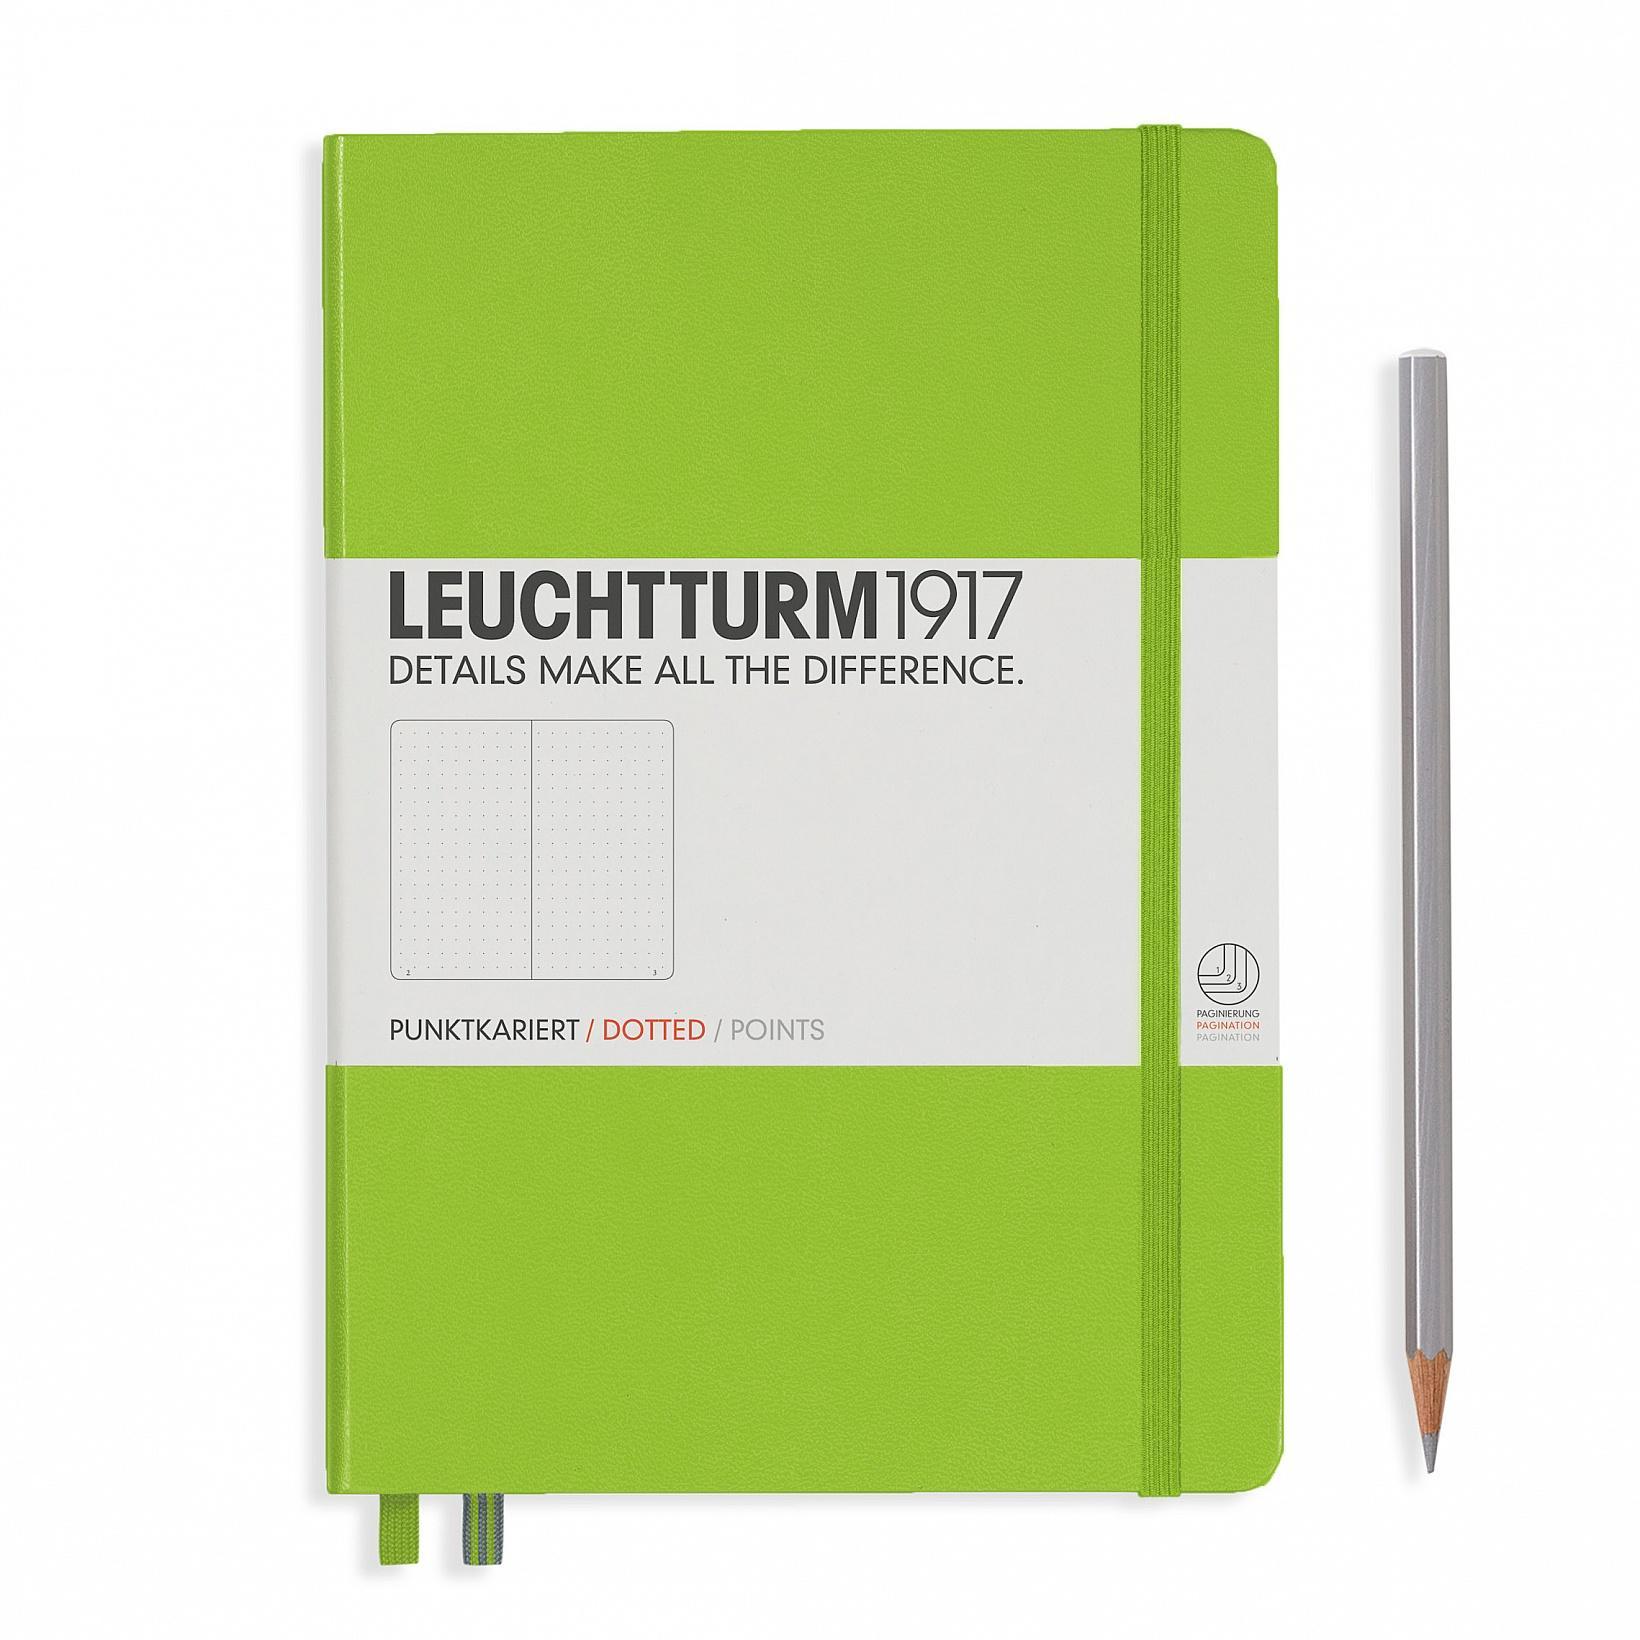 Leuchtturm 1917 A5 Medium Hardcover 249ct Lime Dotted